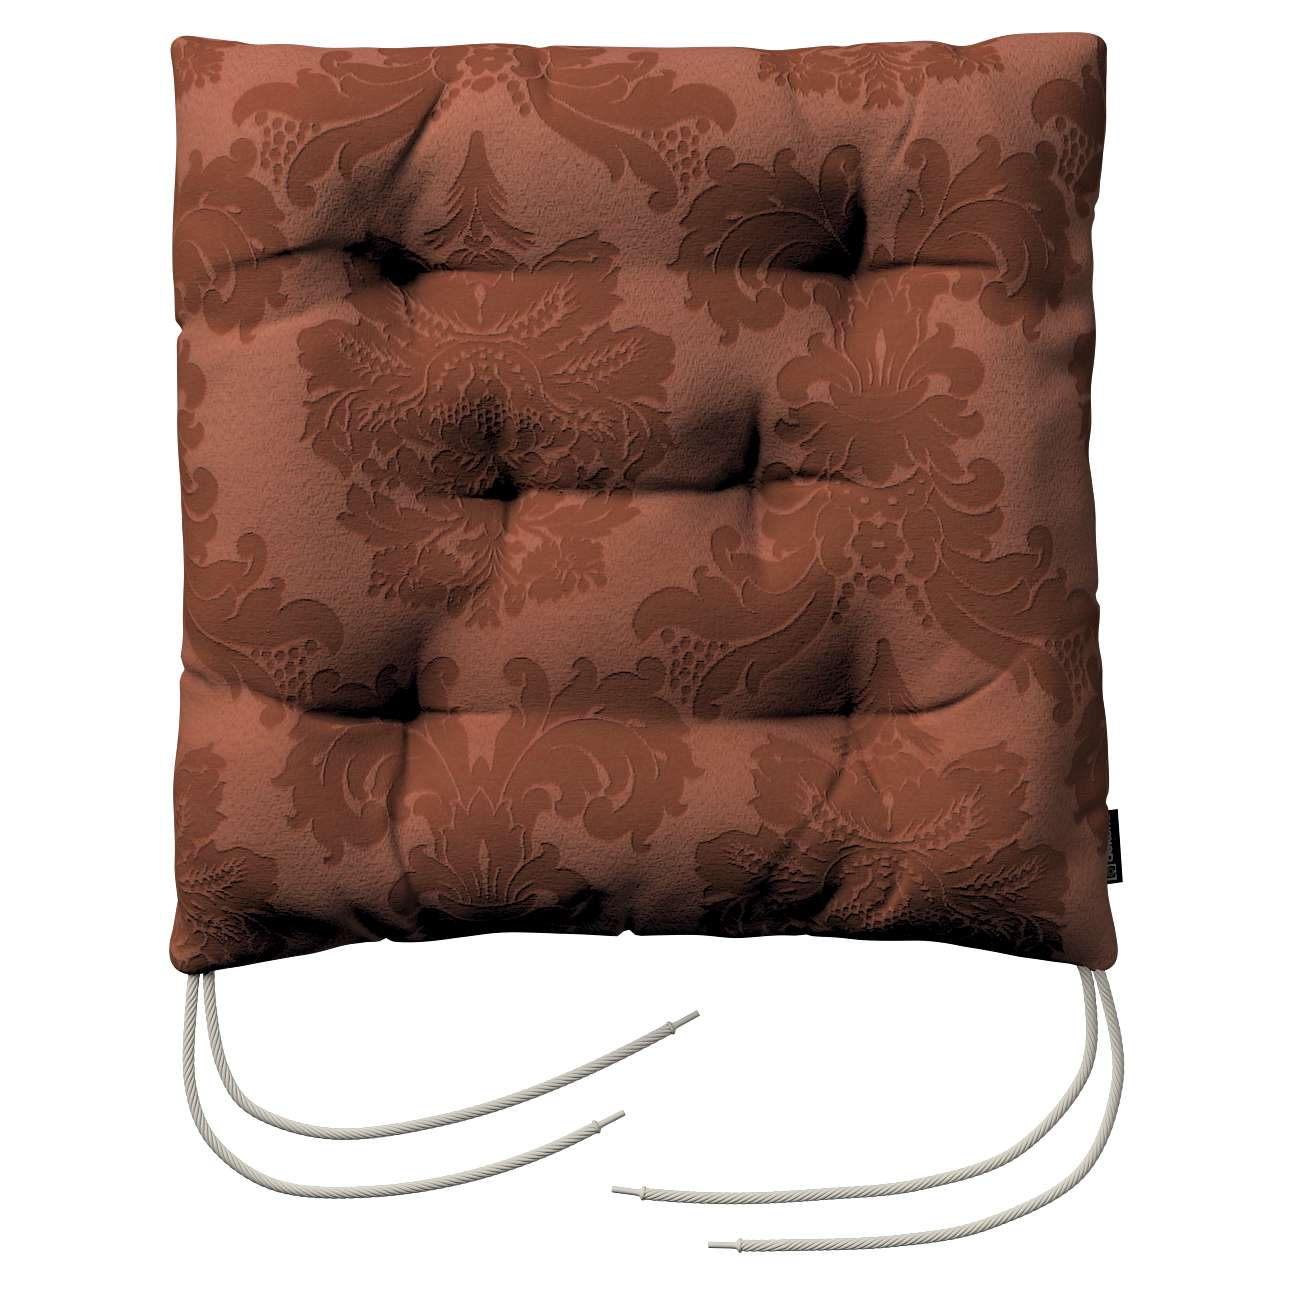 Kėdės pagalvėlė Jacek  40 x 40 x 8 cm kolekcijoje Damasco, audinys: 613-88